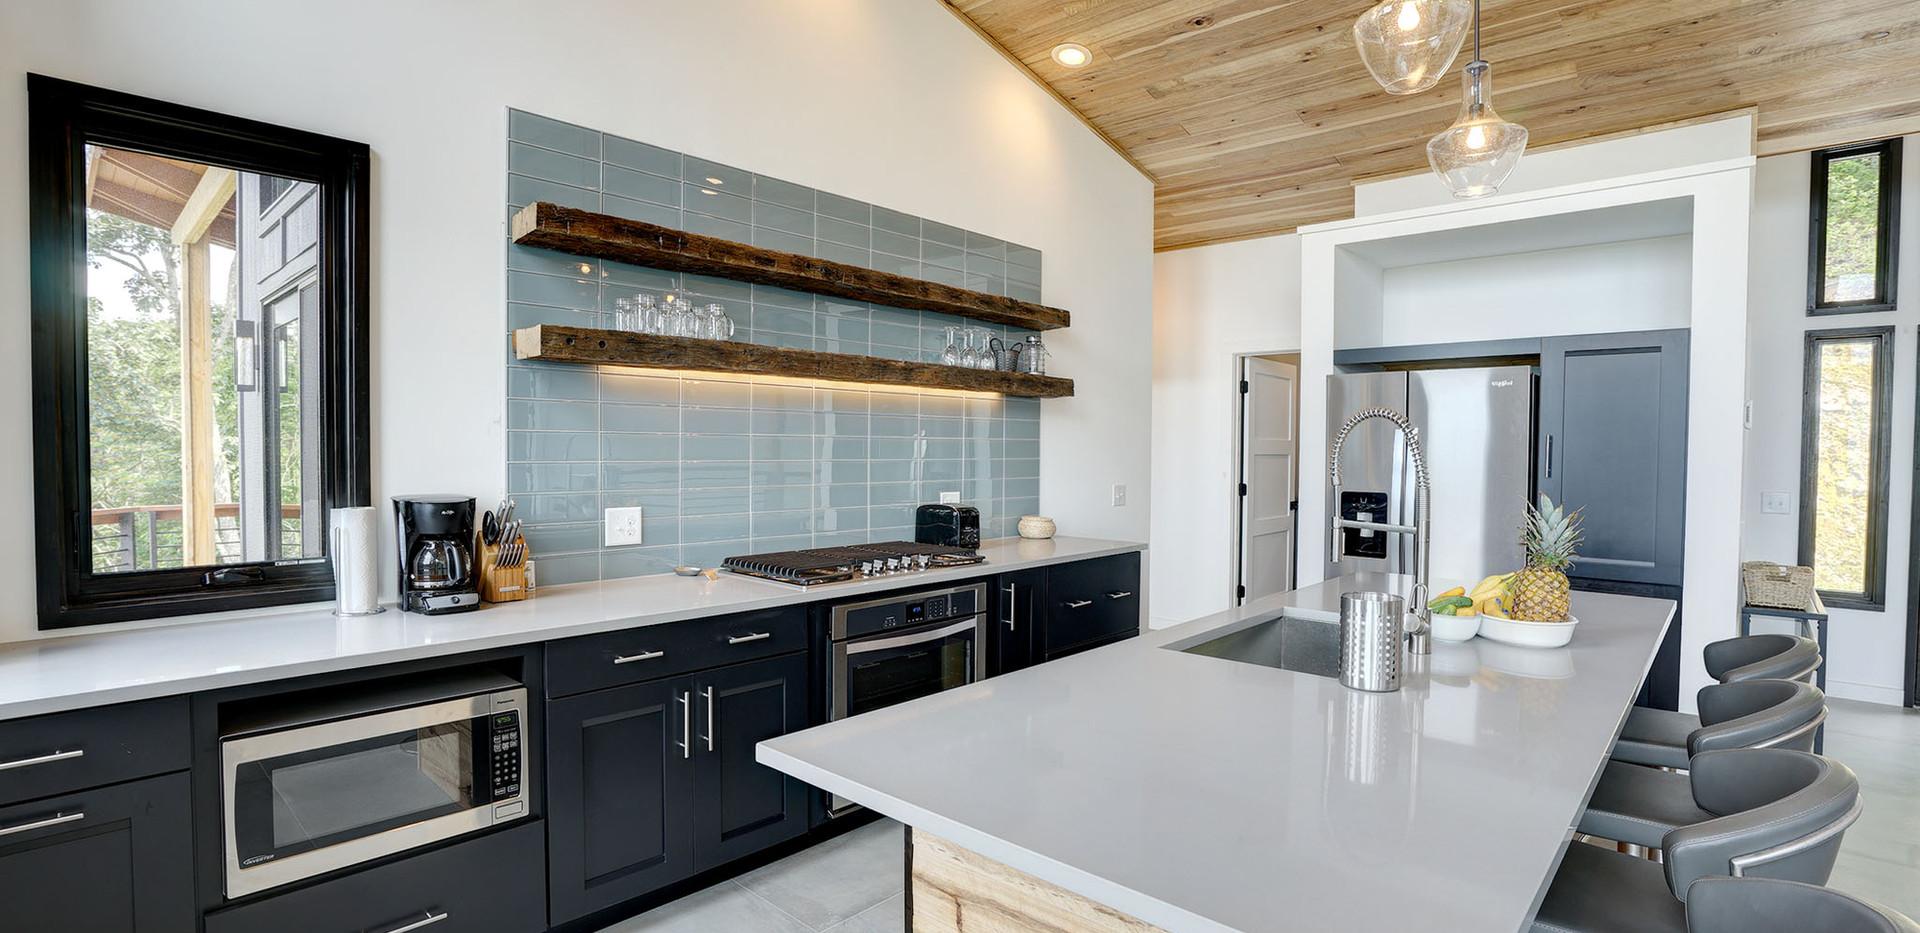 Sunset Falls - kitchen2